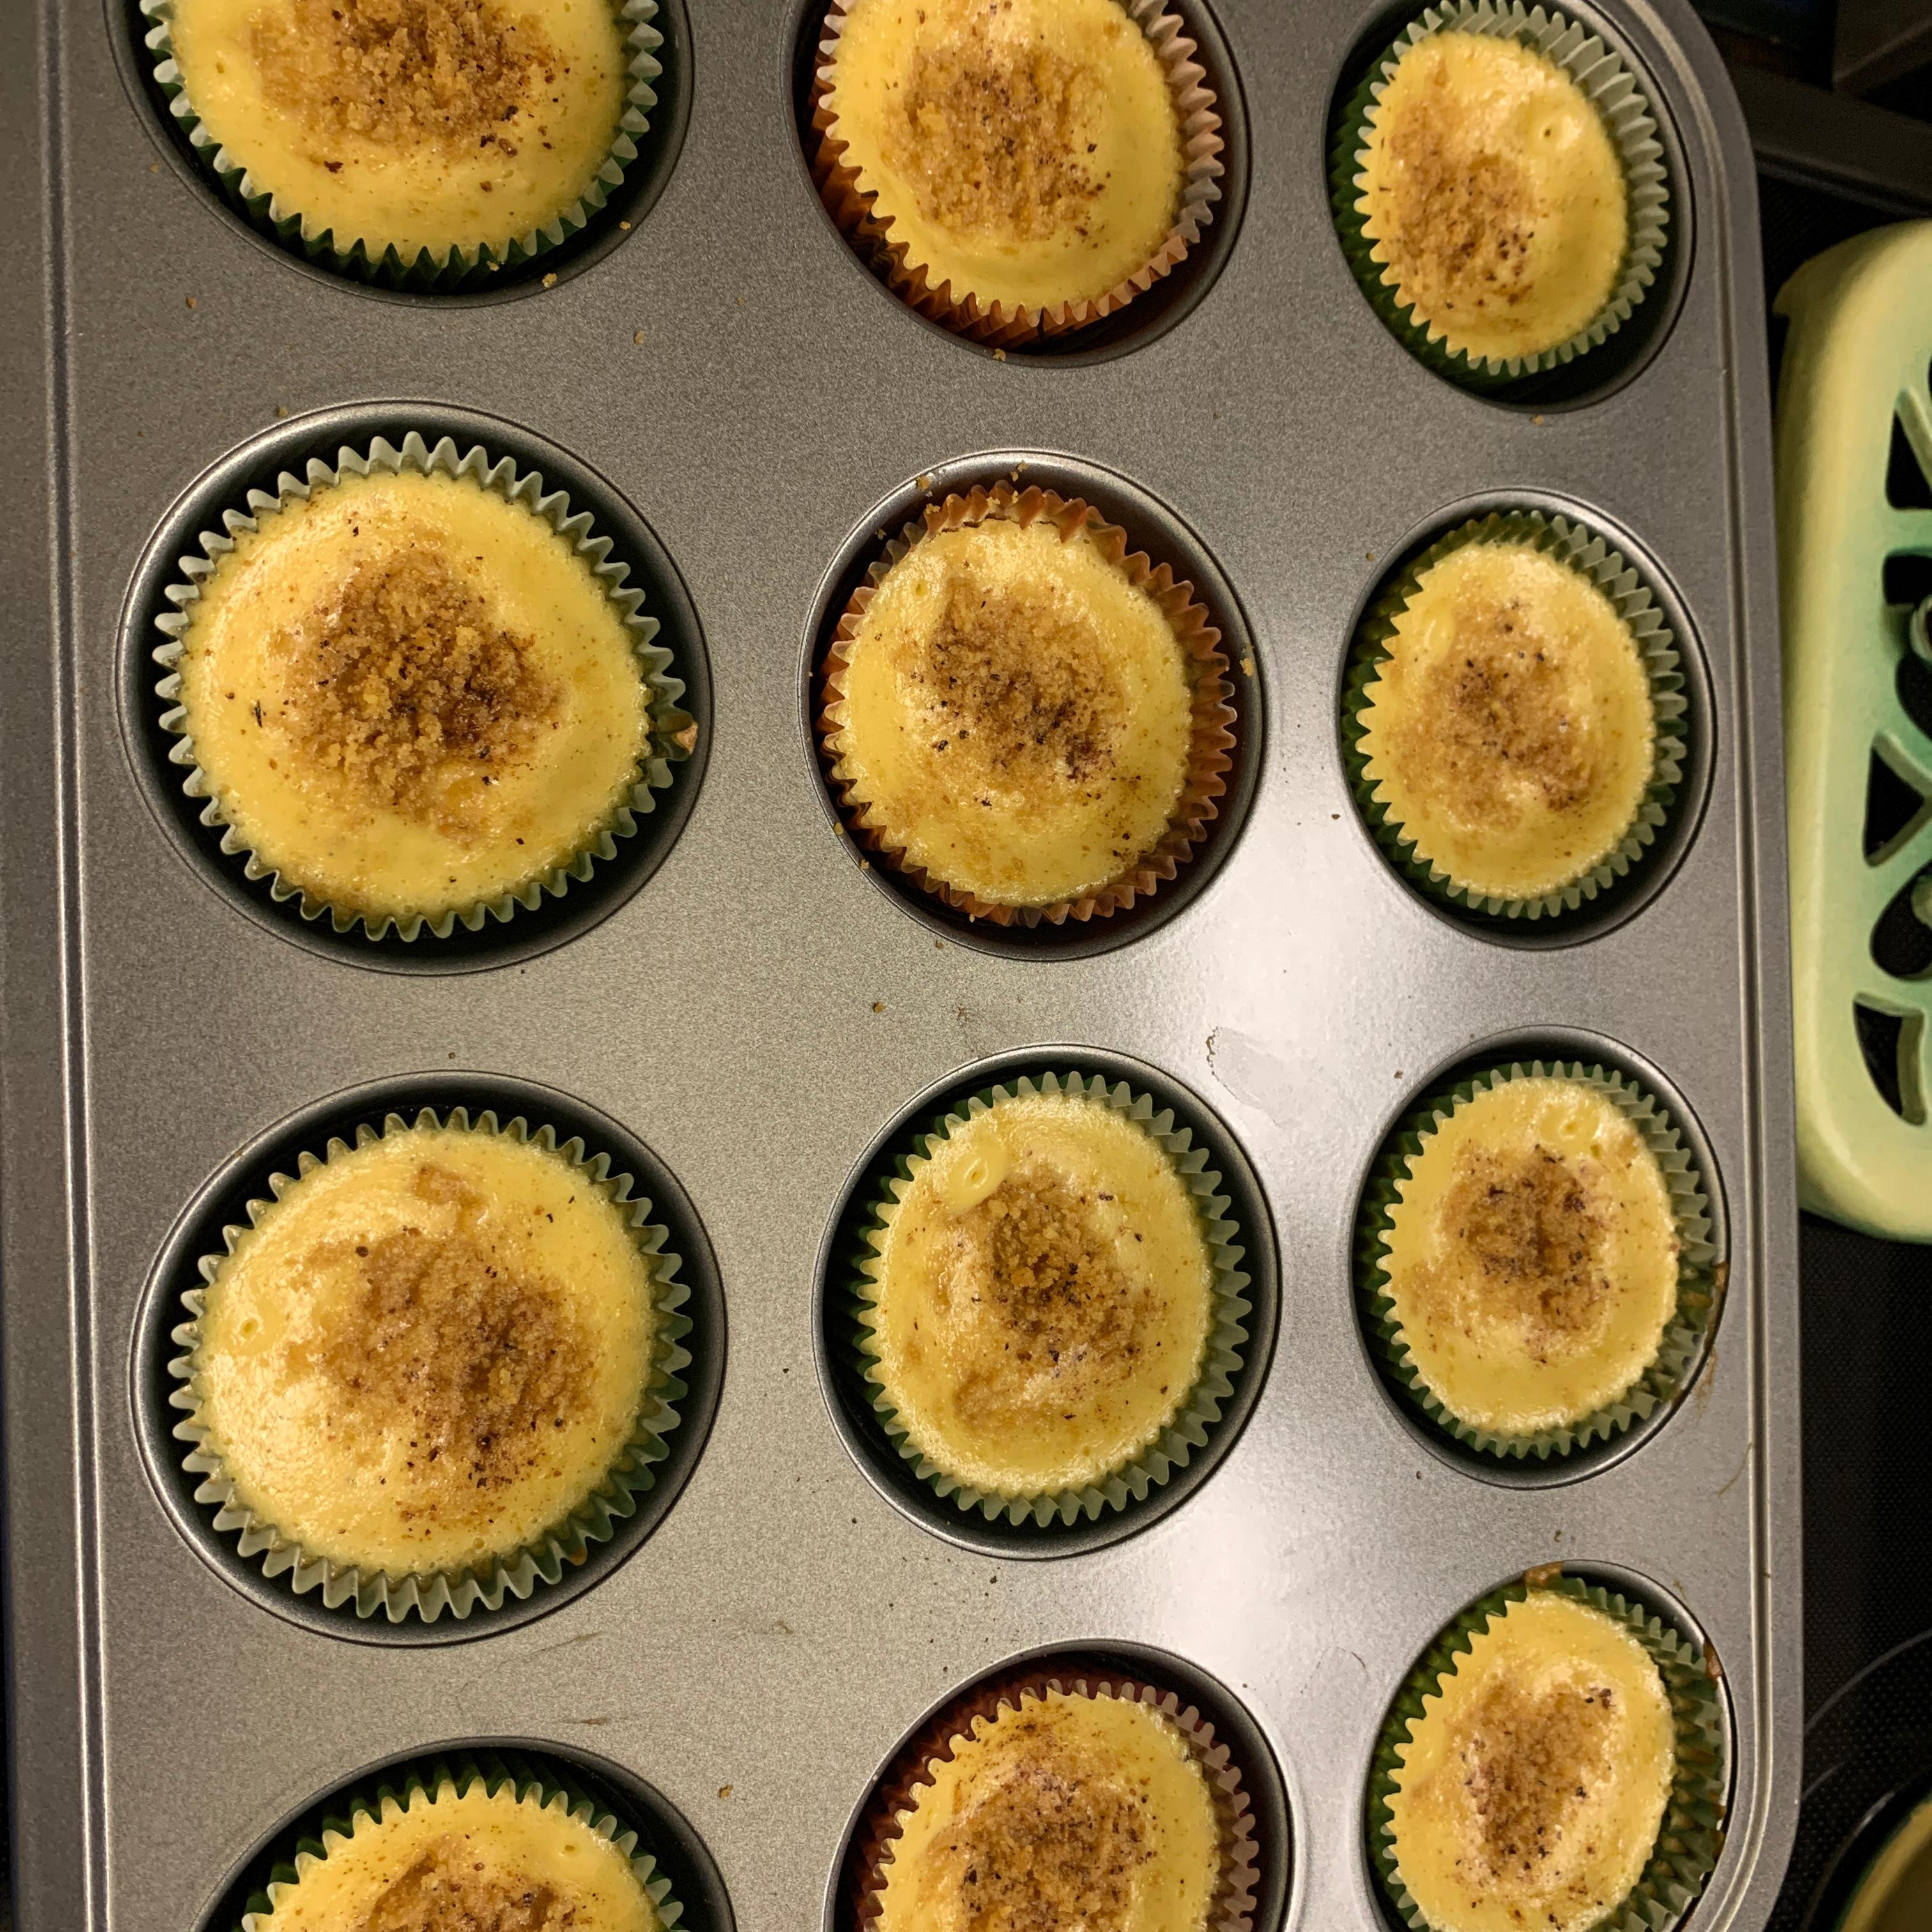 Mini Pumpkin Cheesecakes from Reddi-wip® Lorie Ann Bruning